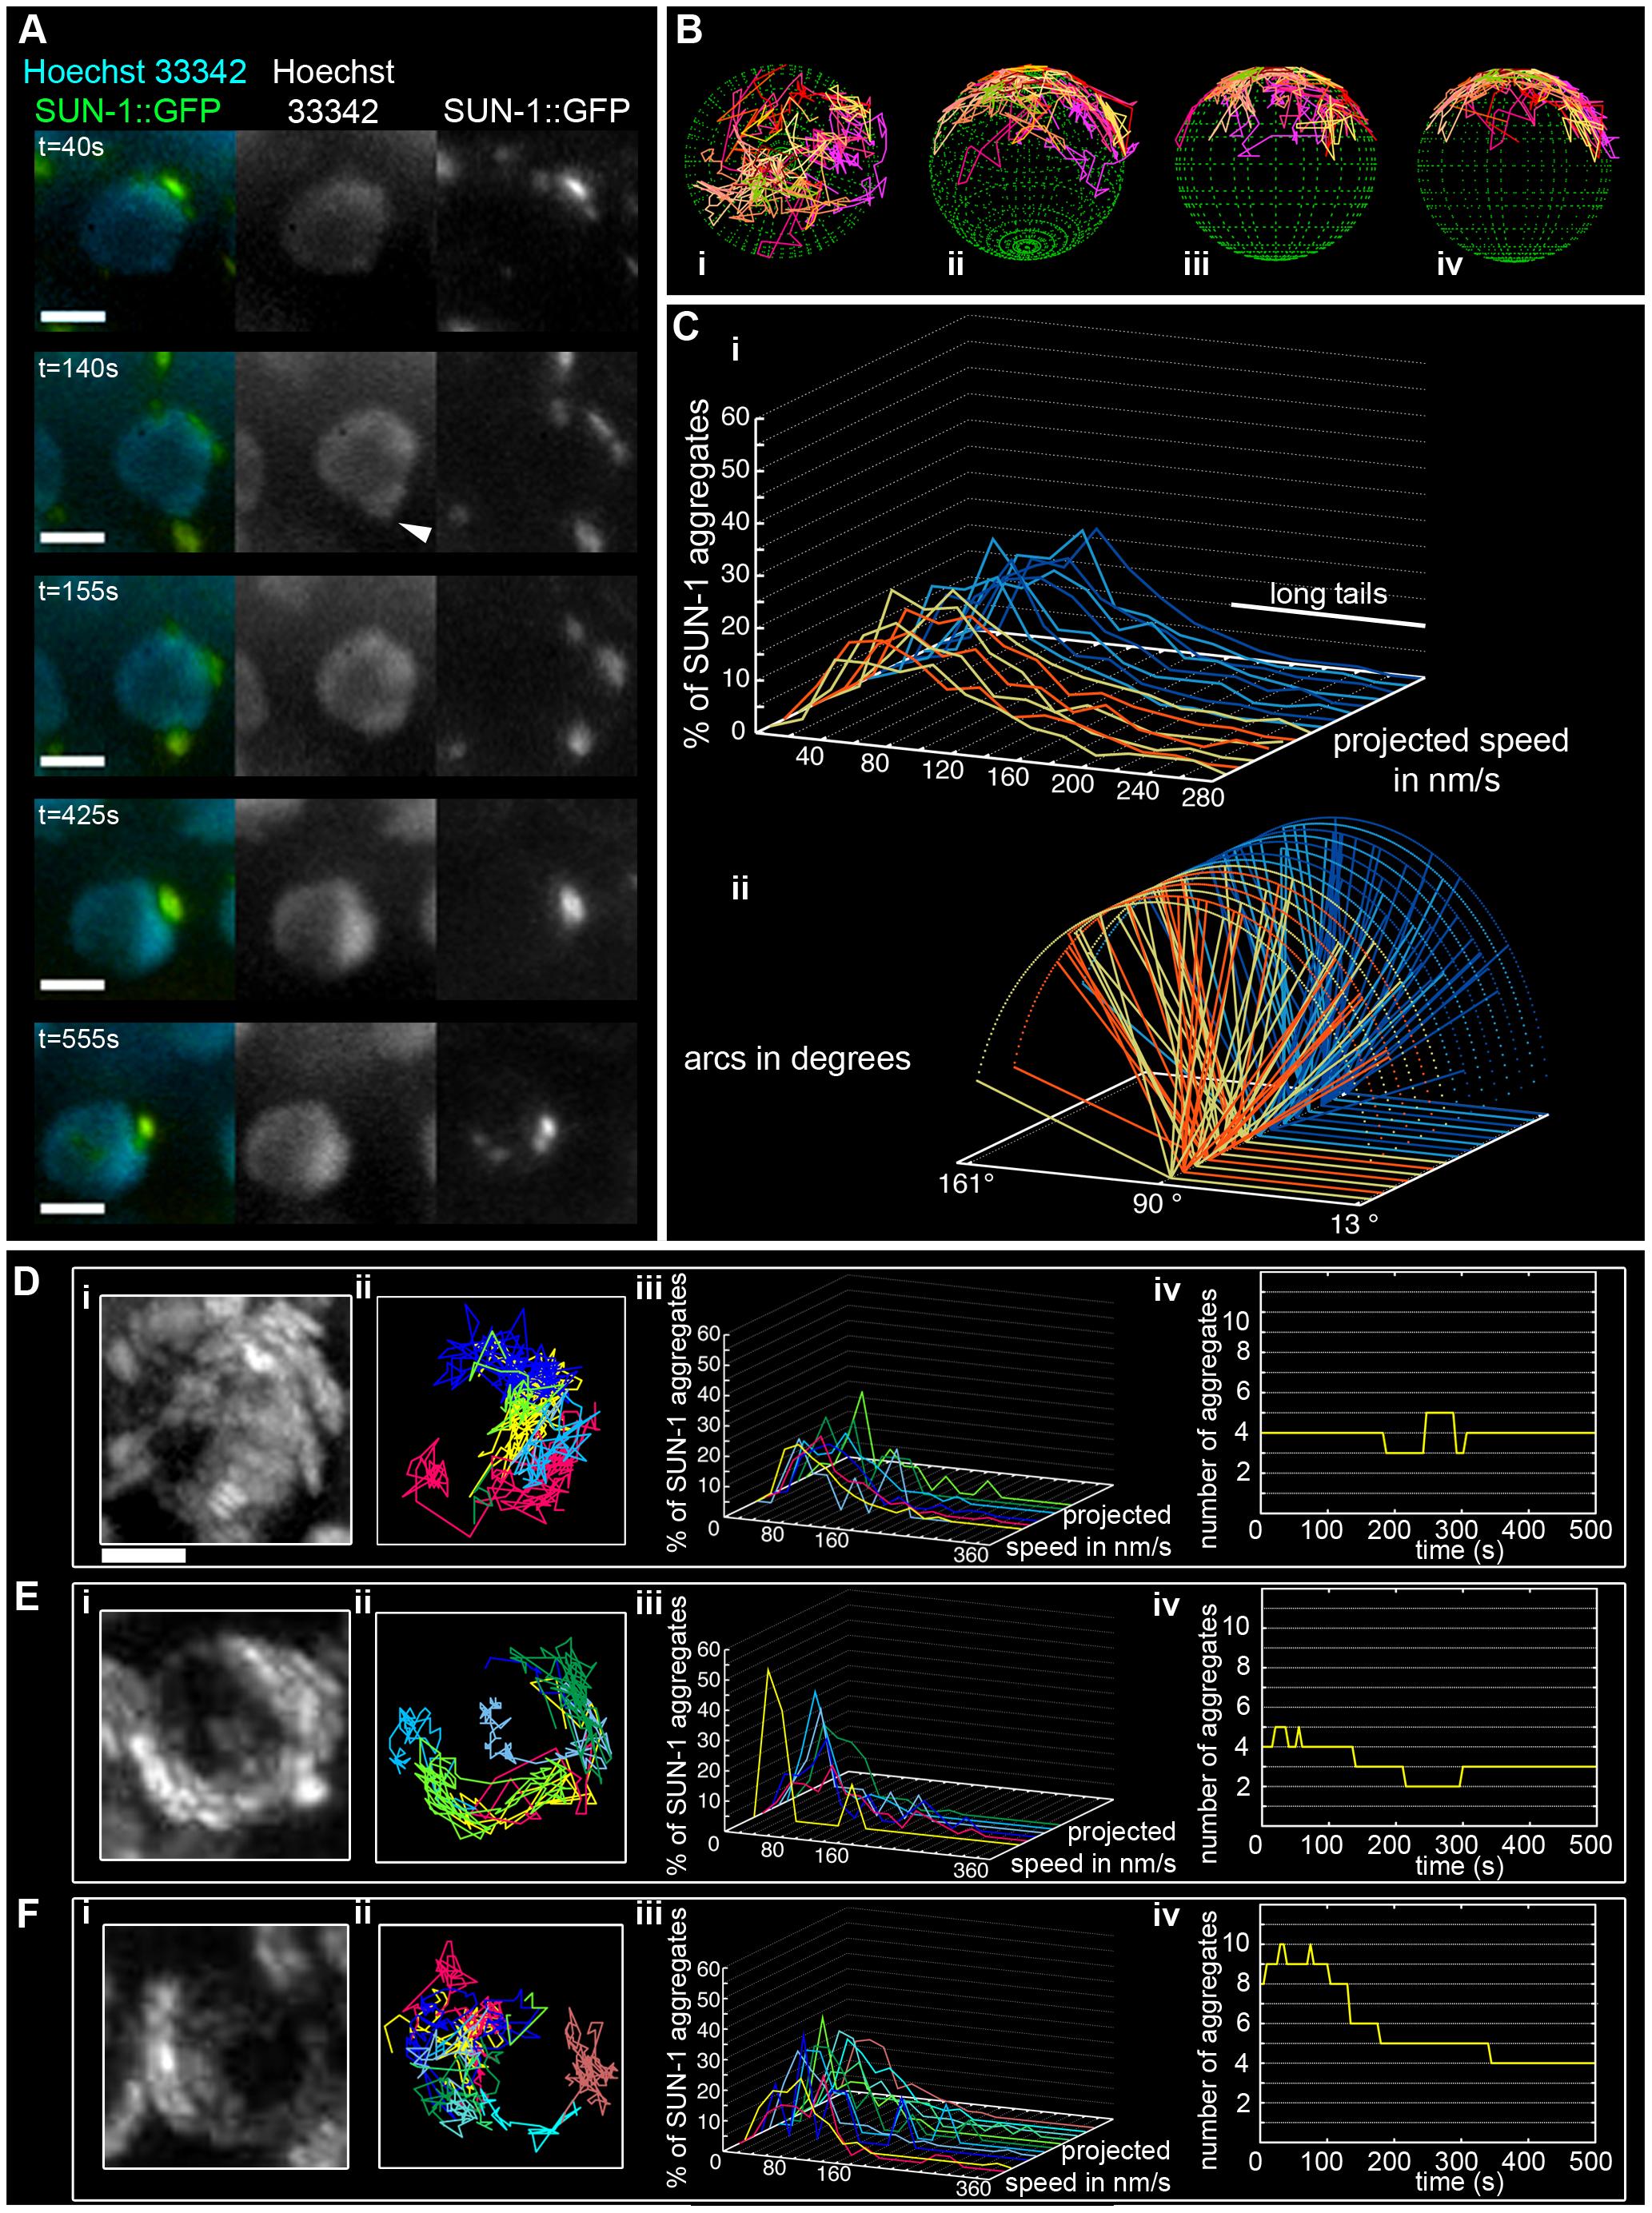 Dynamics of SUN-1 aggregates.